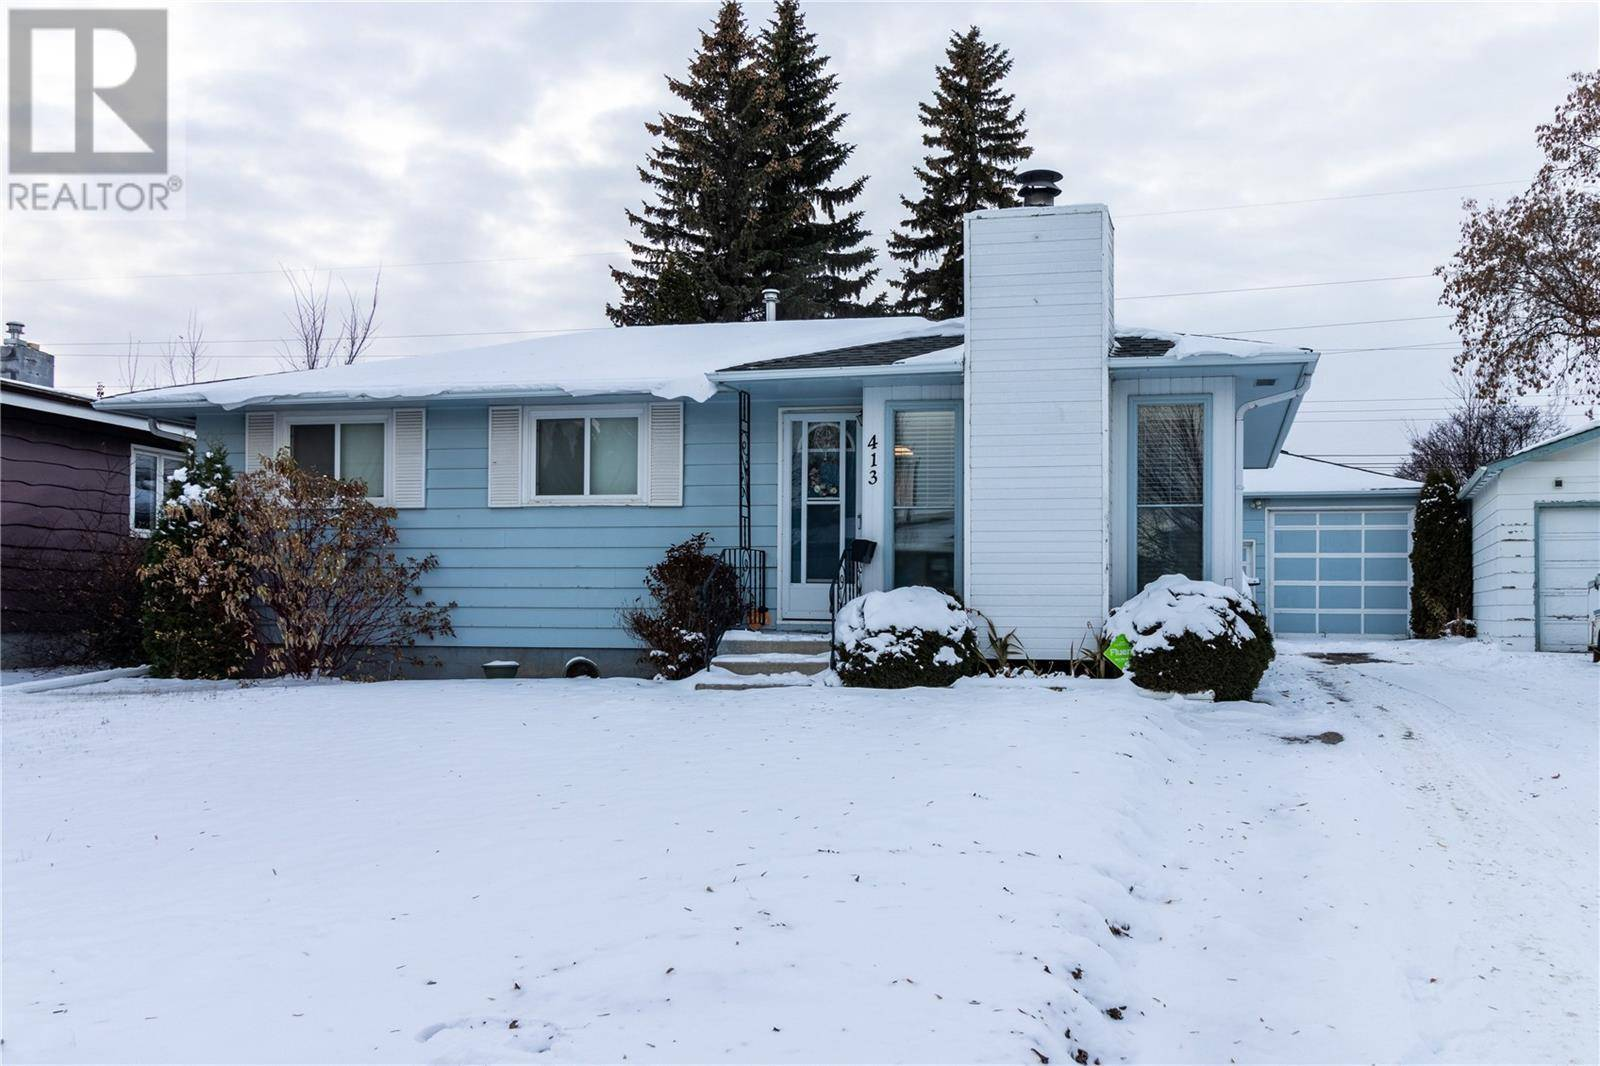 House for sale at 413 Vancouver Ave N Saskatoon Saskatchewan - MLS: SK790490